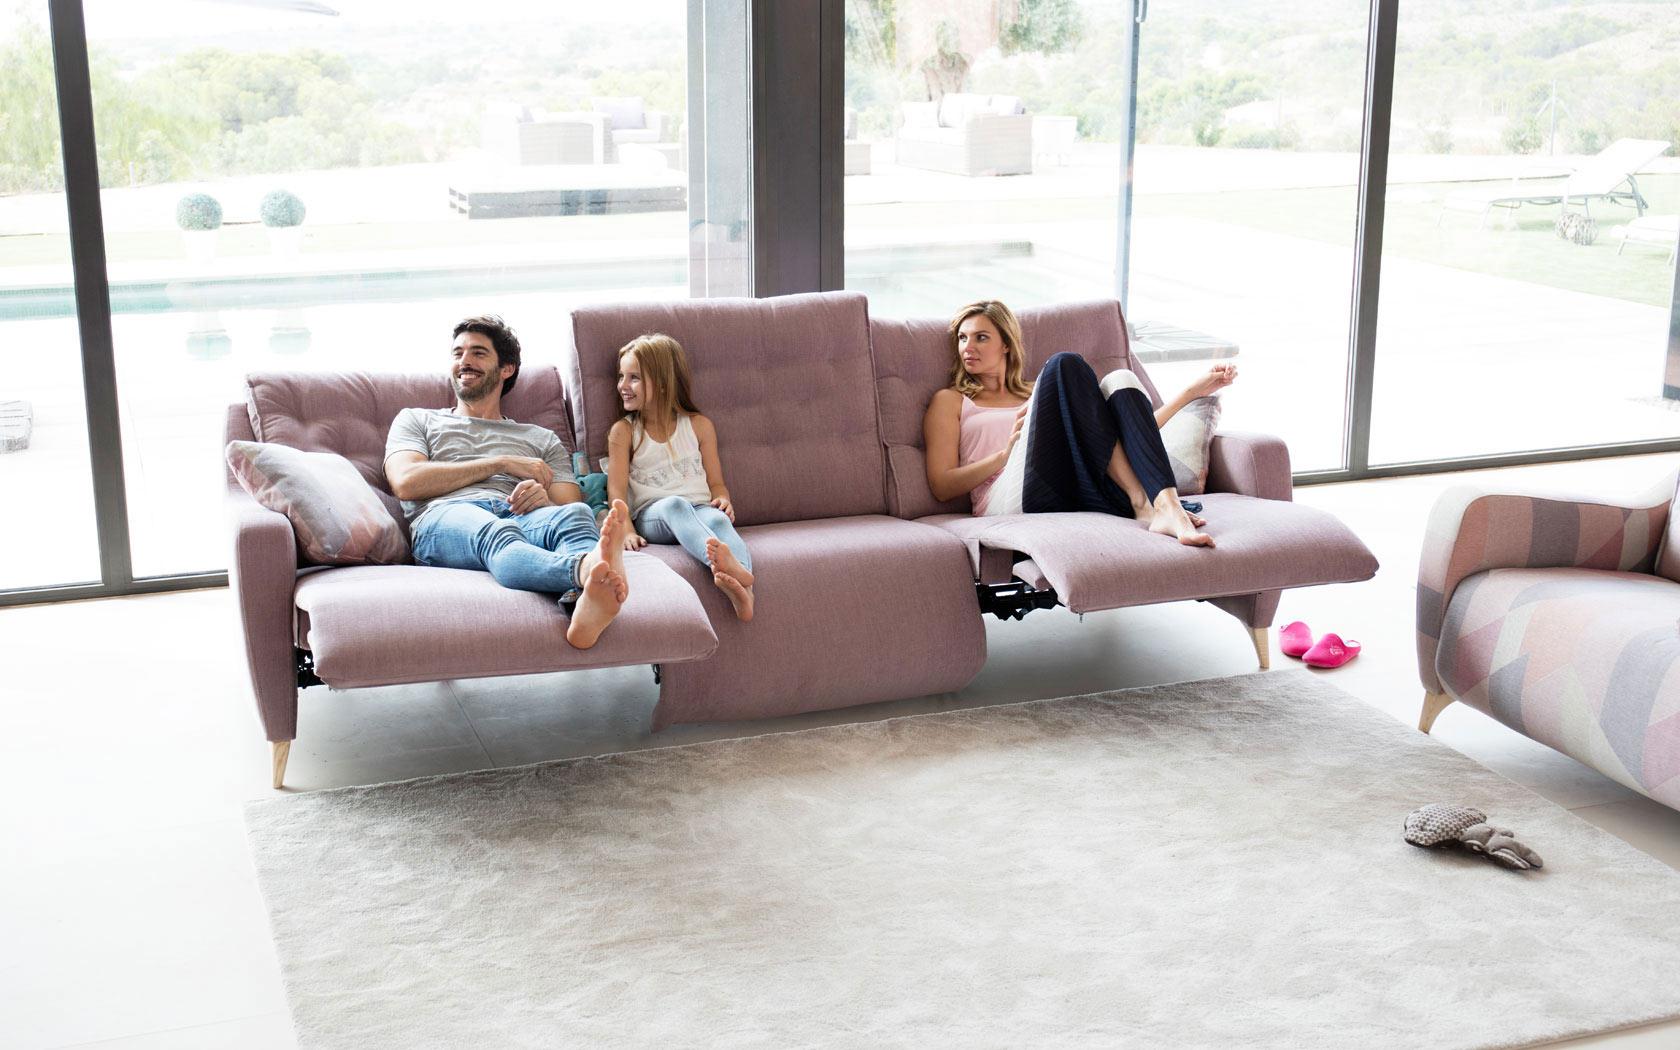 Avalon sofa relax 2019 06